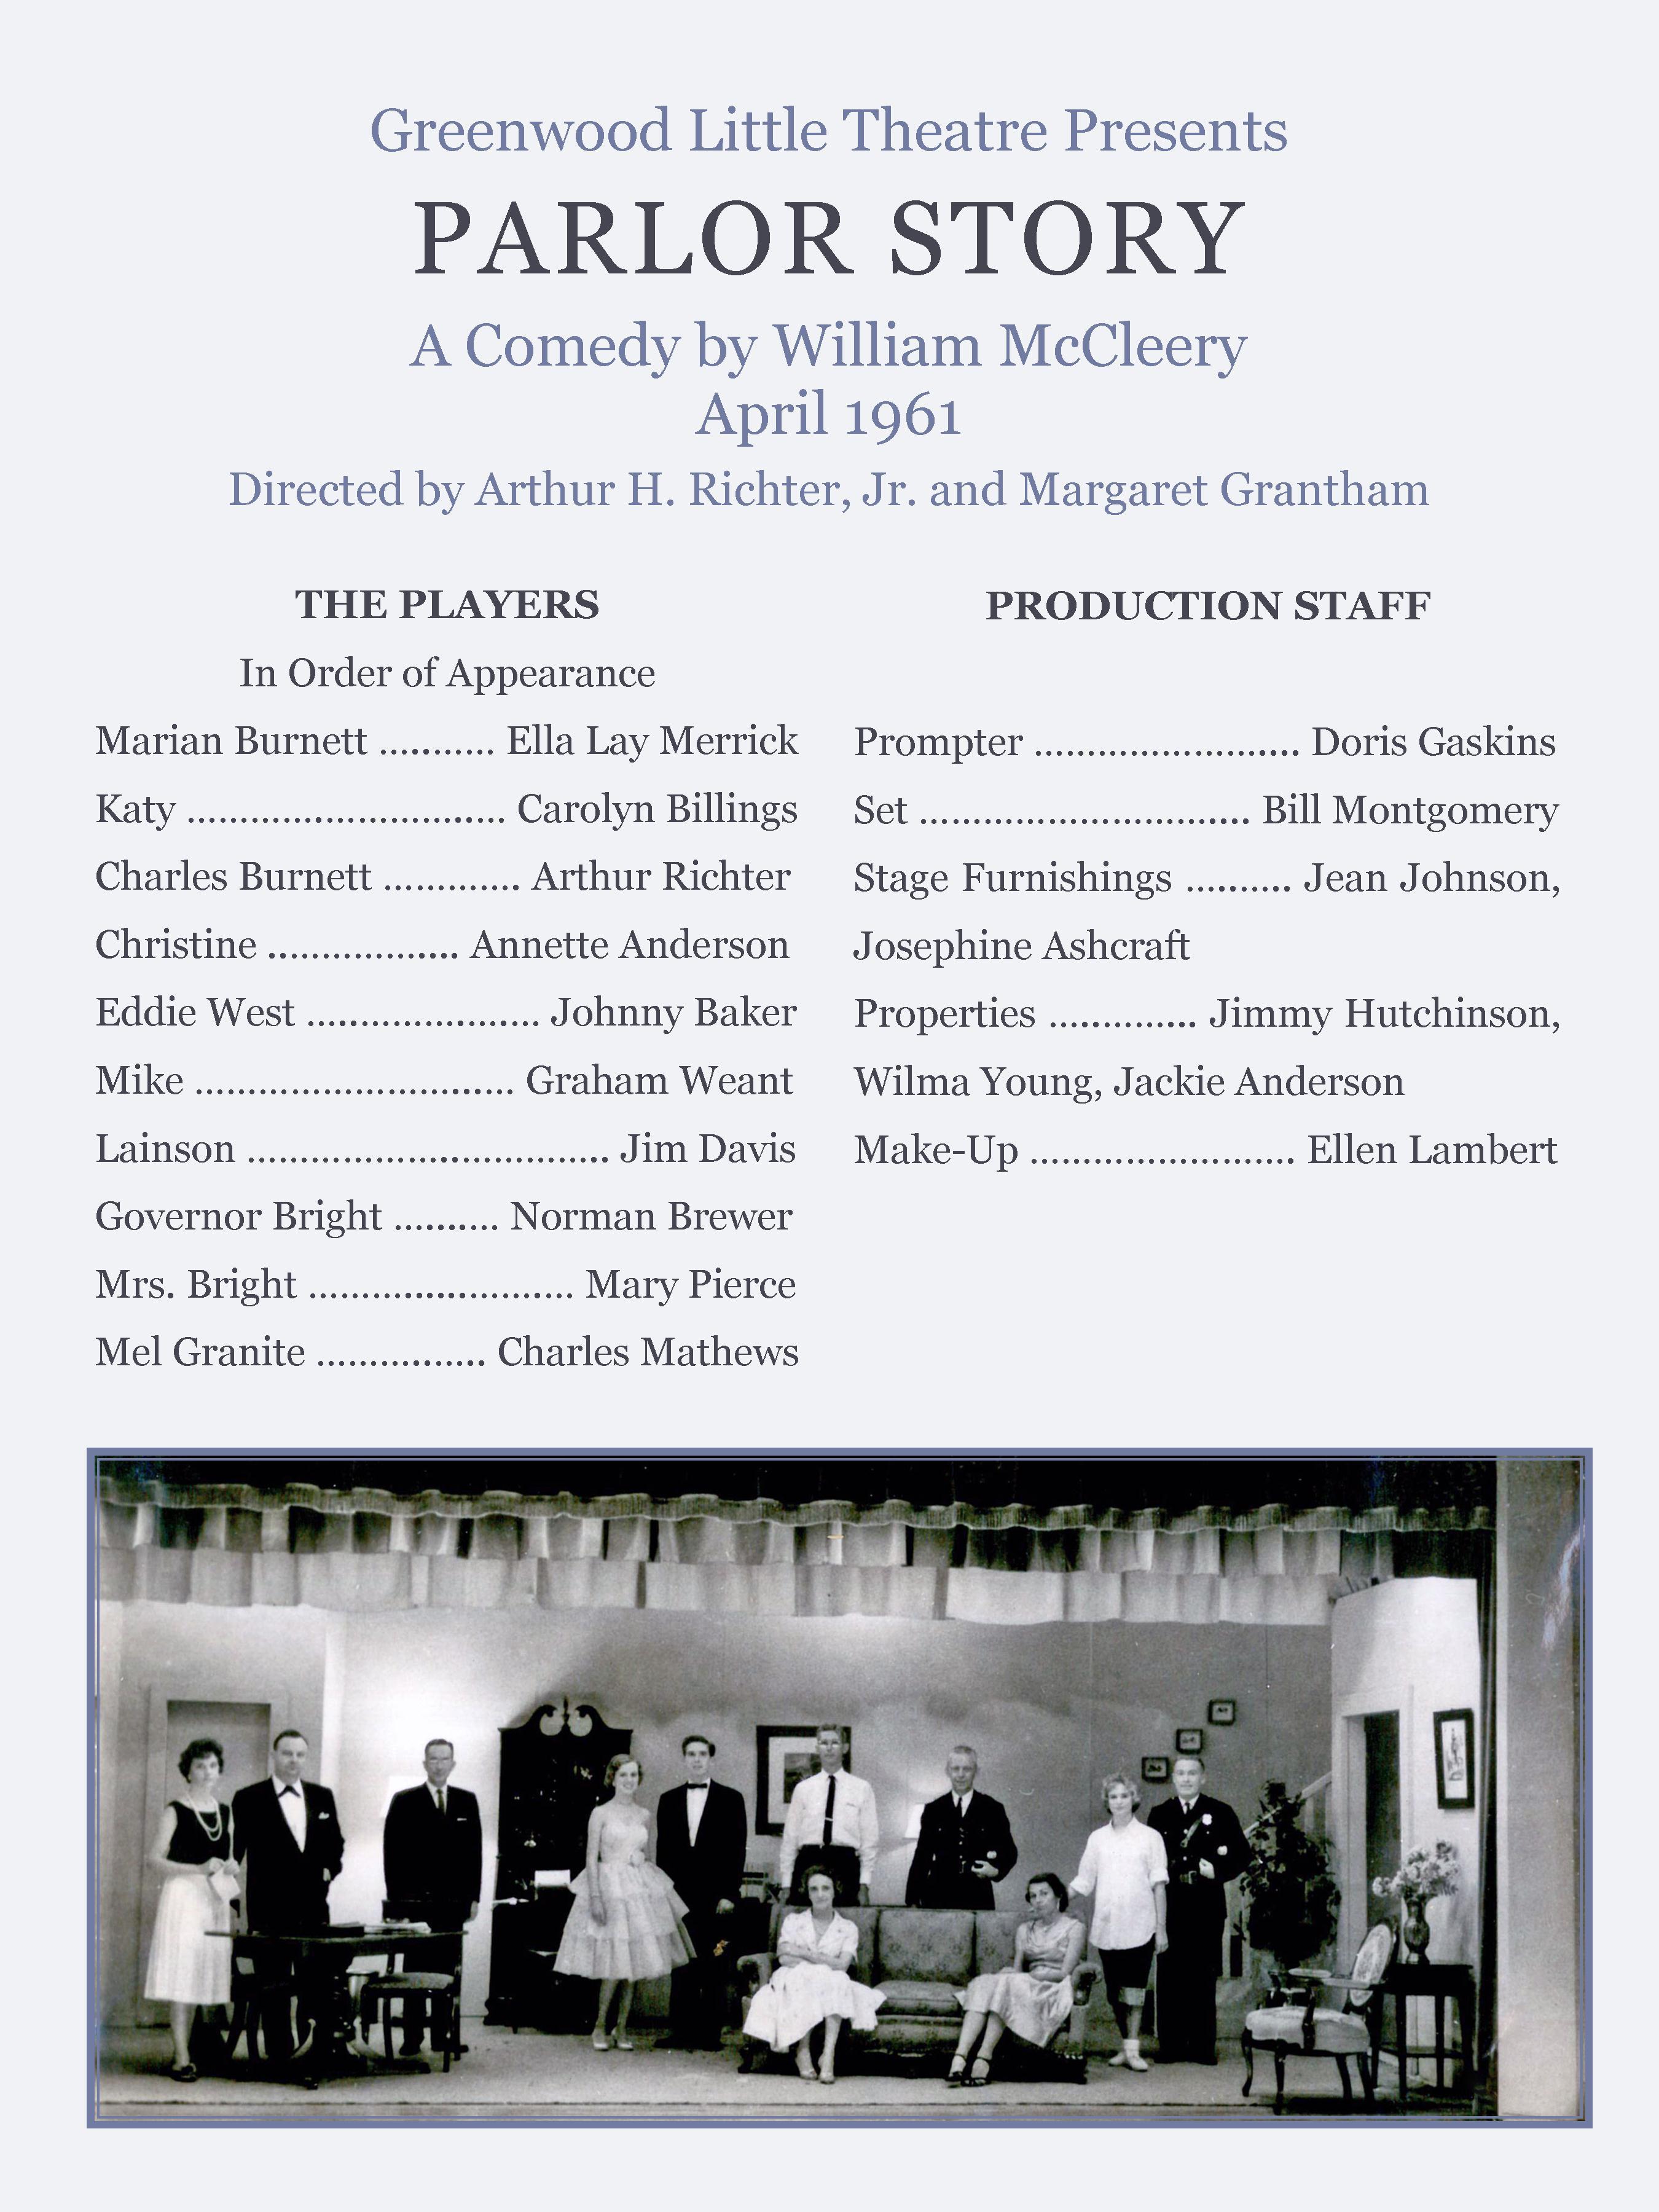 History — Greenwood Little Theatre